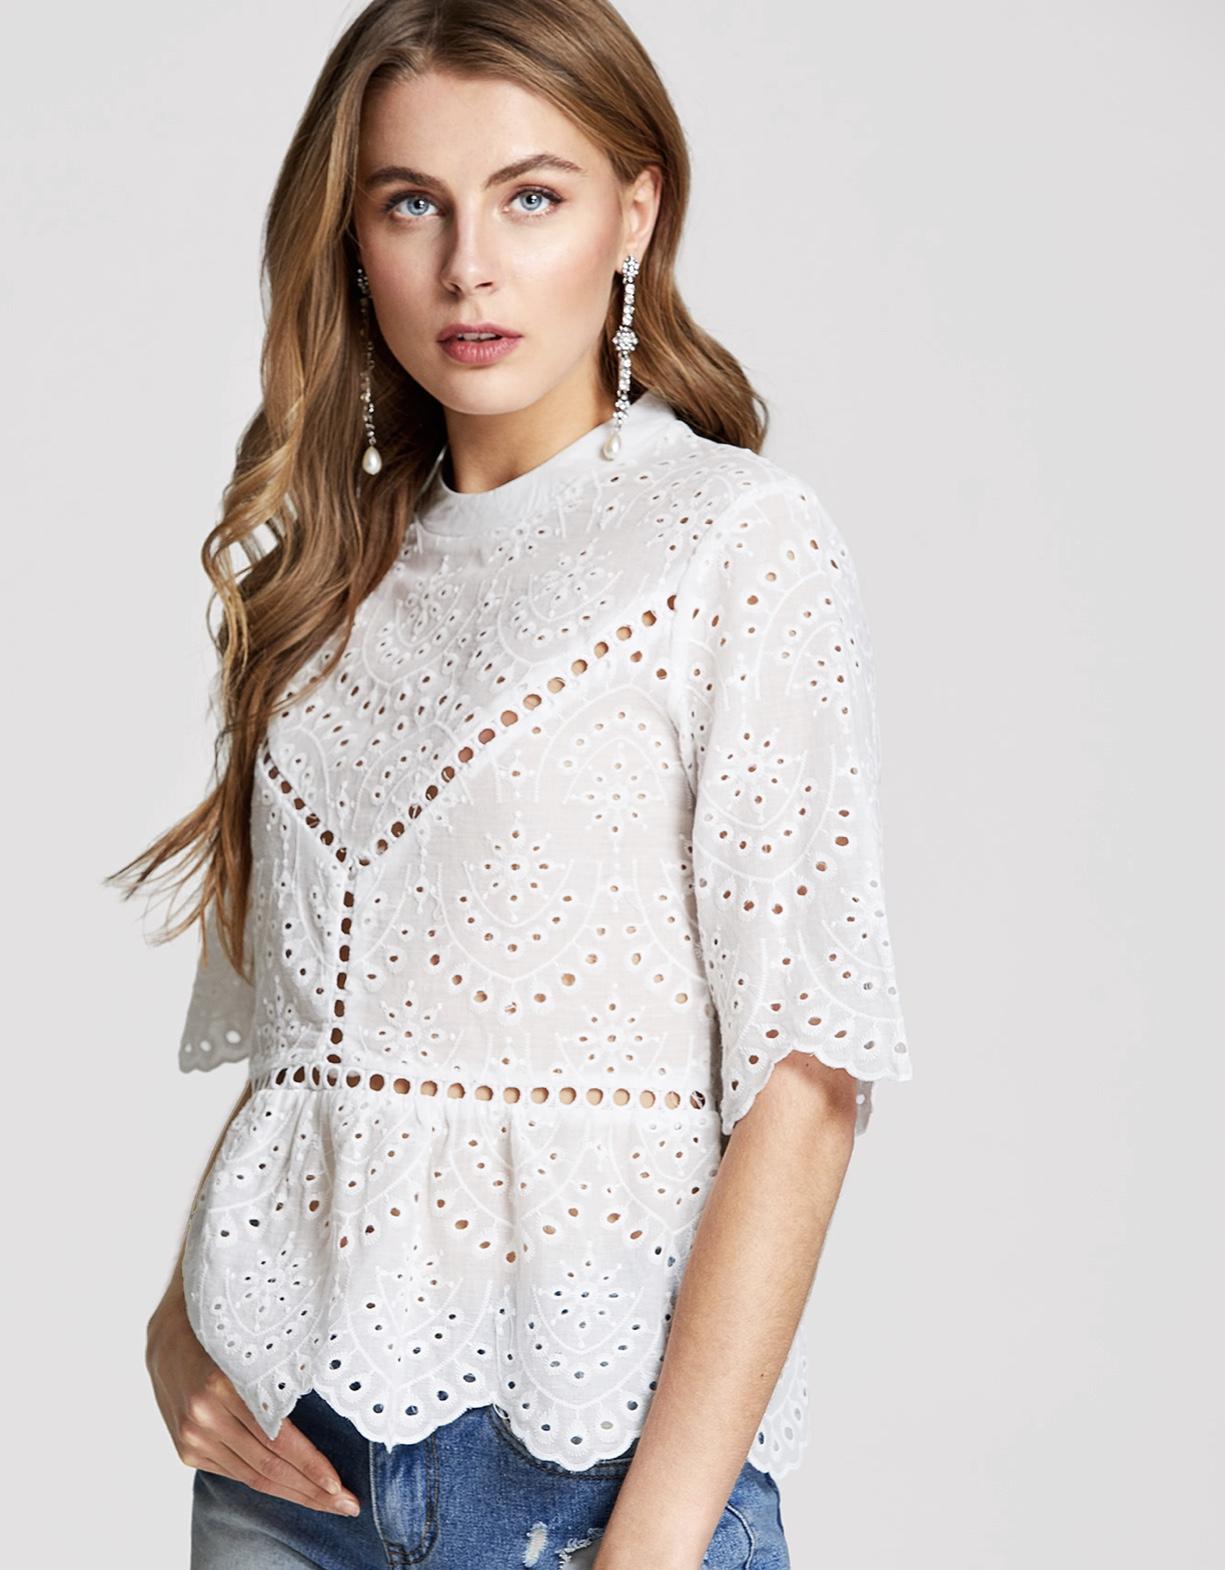 White tops for Spring